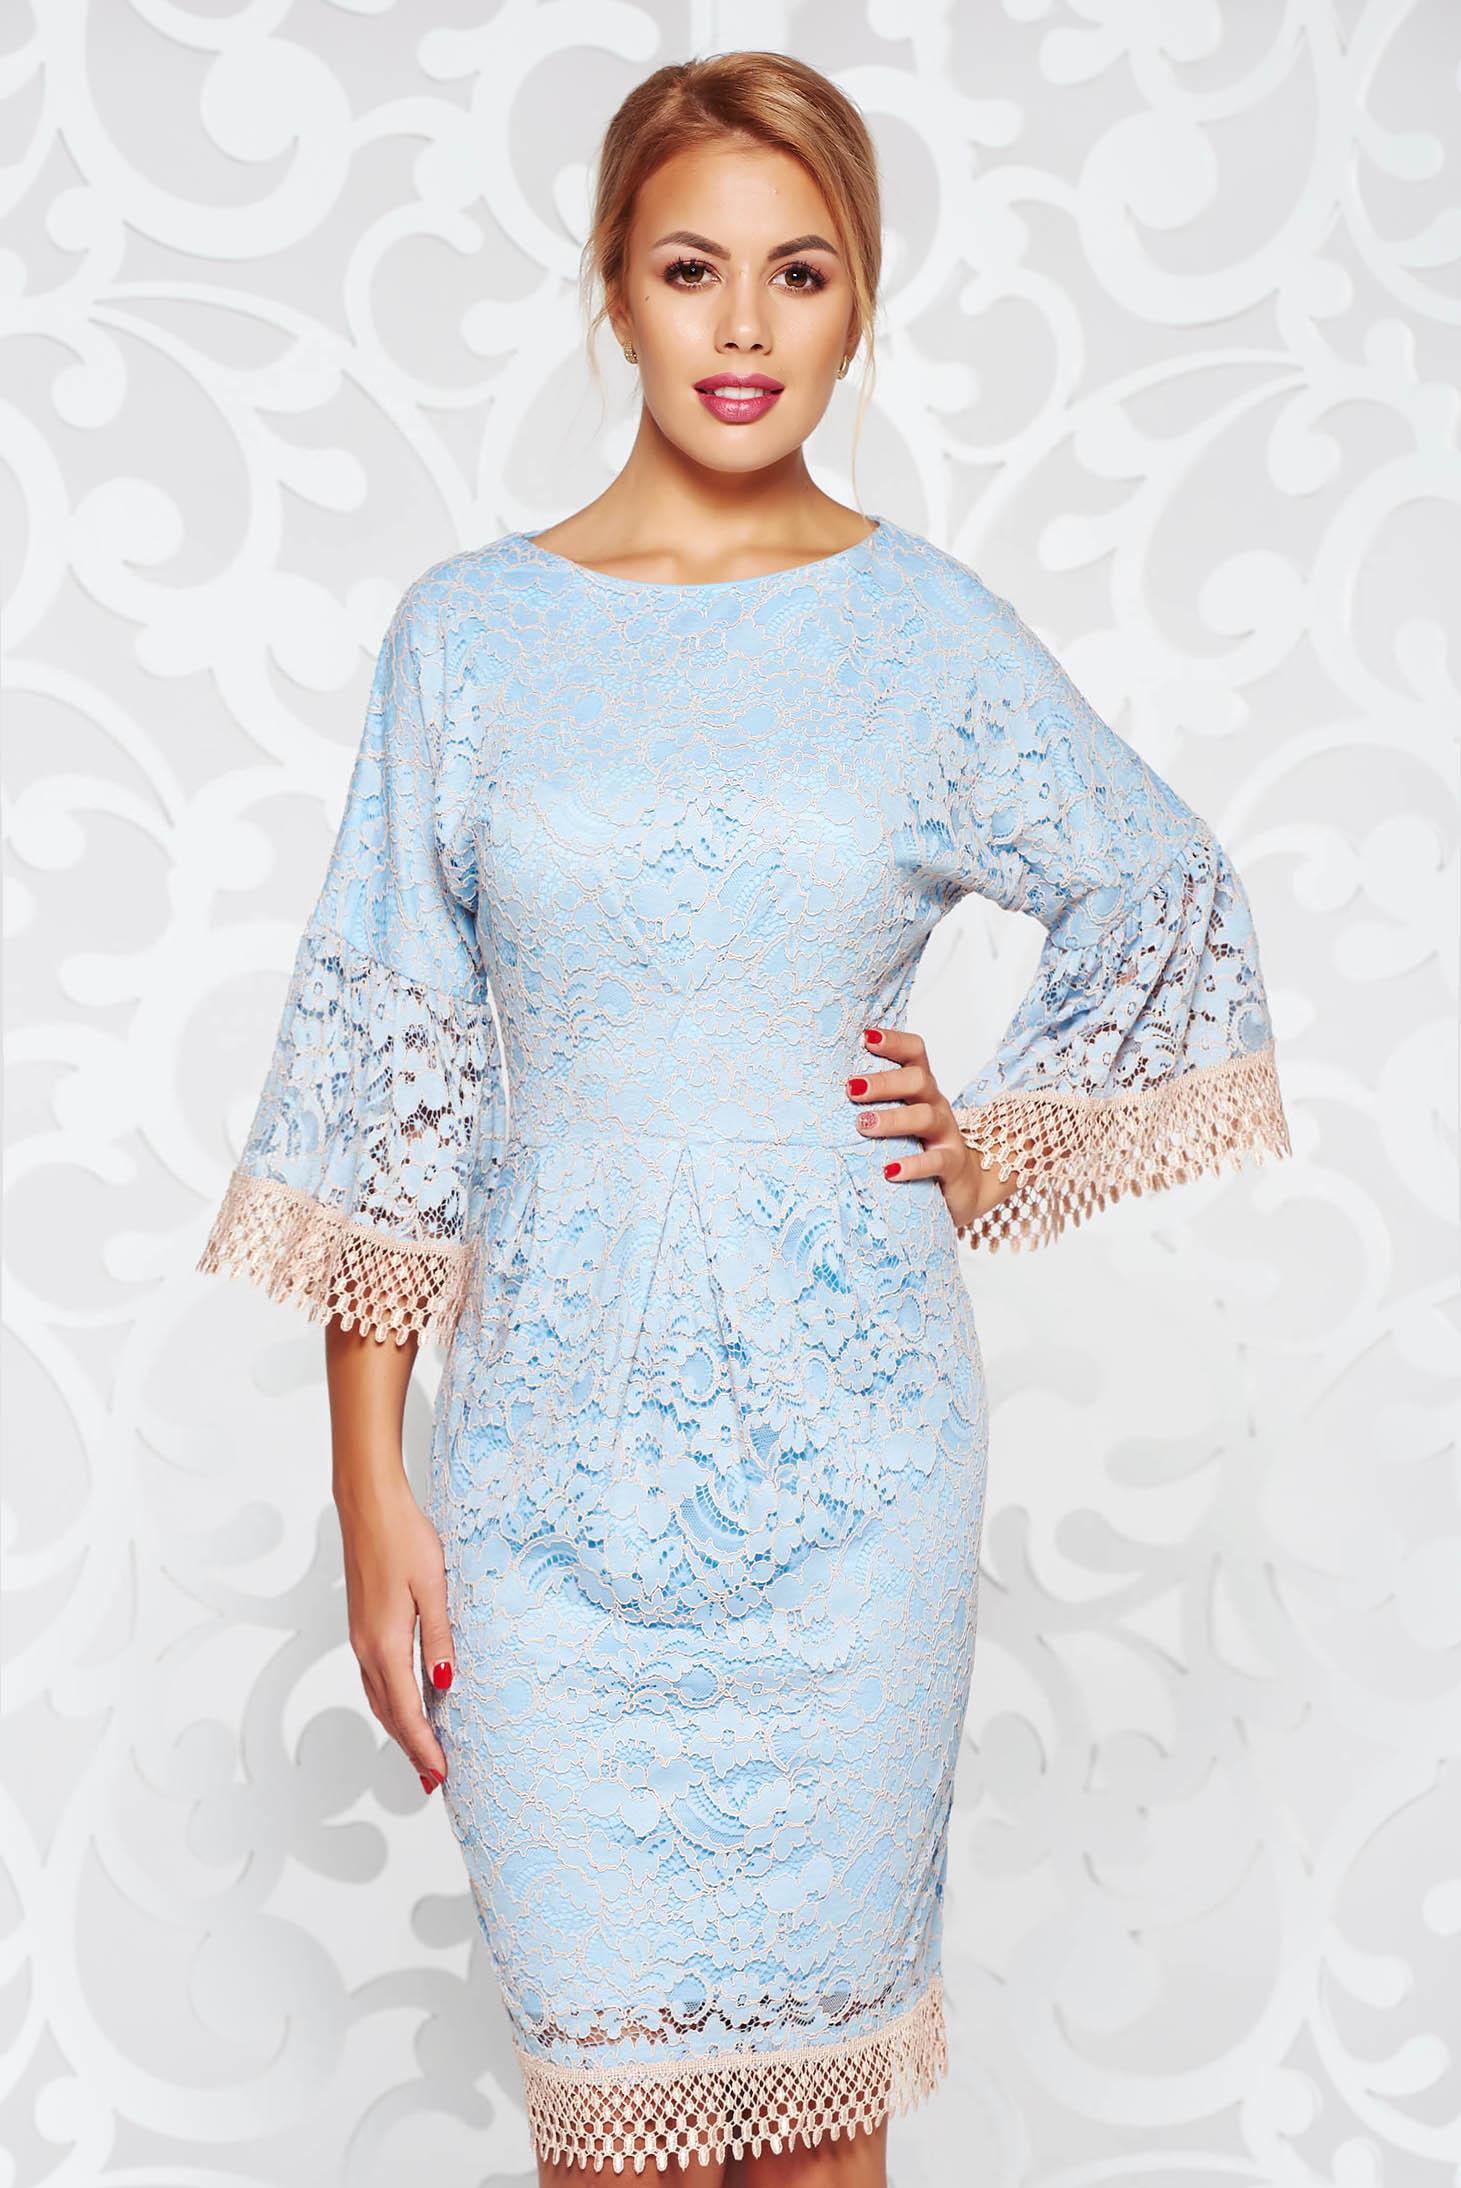 Rochie albastra-deschis eleganta tip creion din dantela captusita pe interior cu maneci clopot